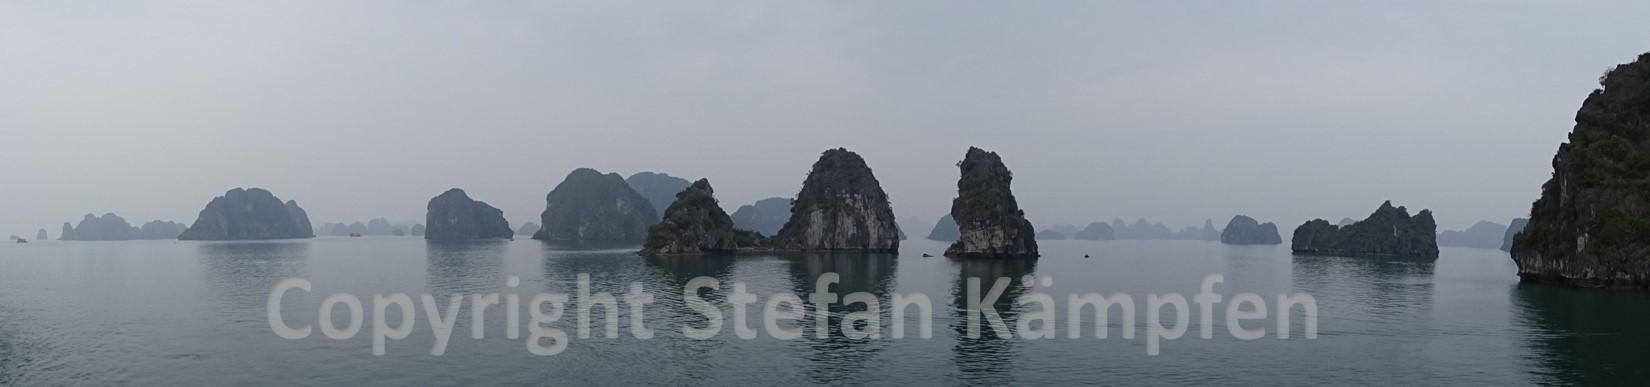 Gehört zum UNESCO Weltnaturerbe: Die Halong Bay